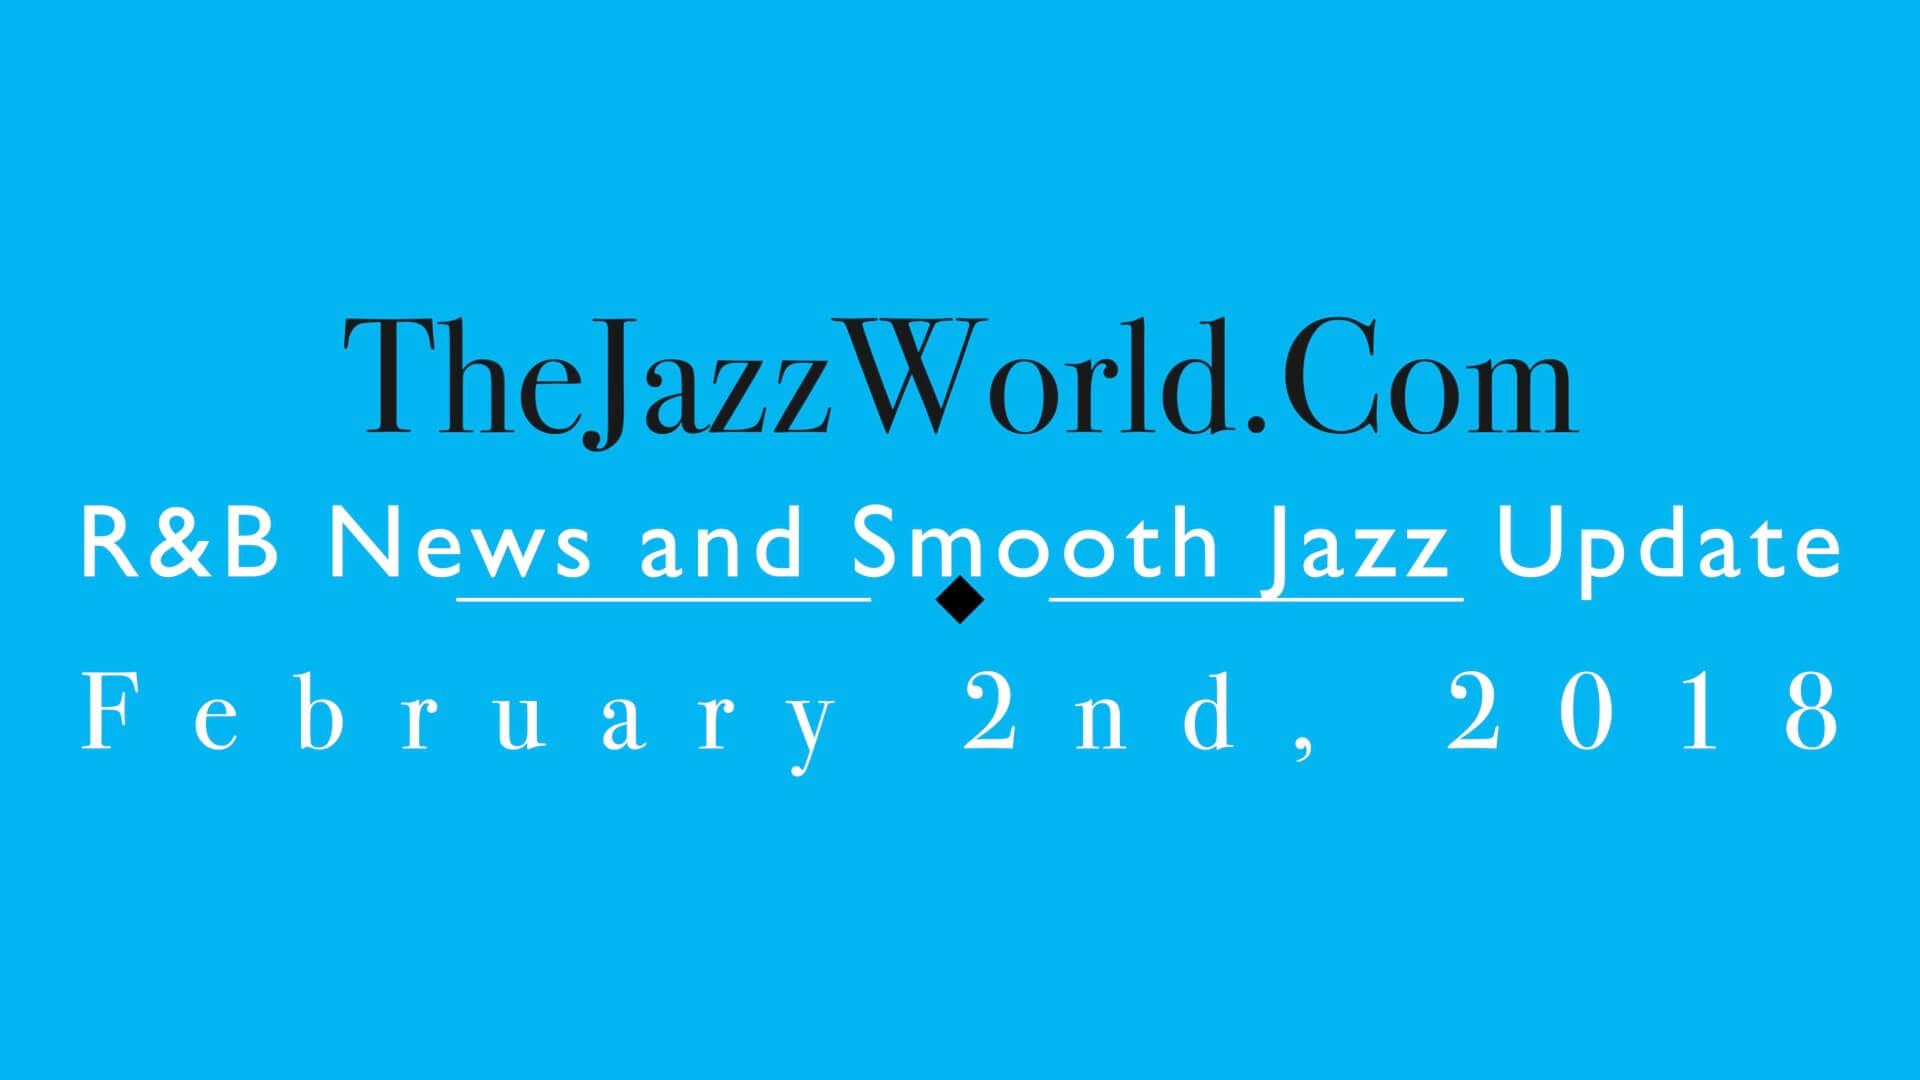 The Jazz World Show 2:2:18